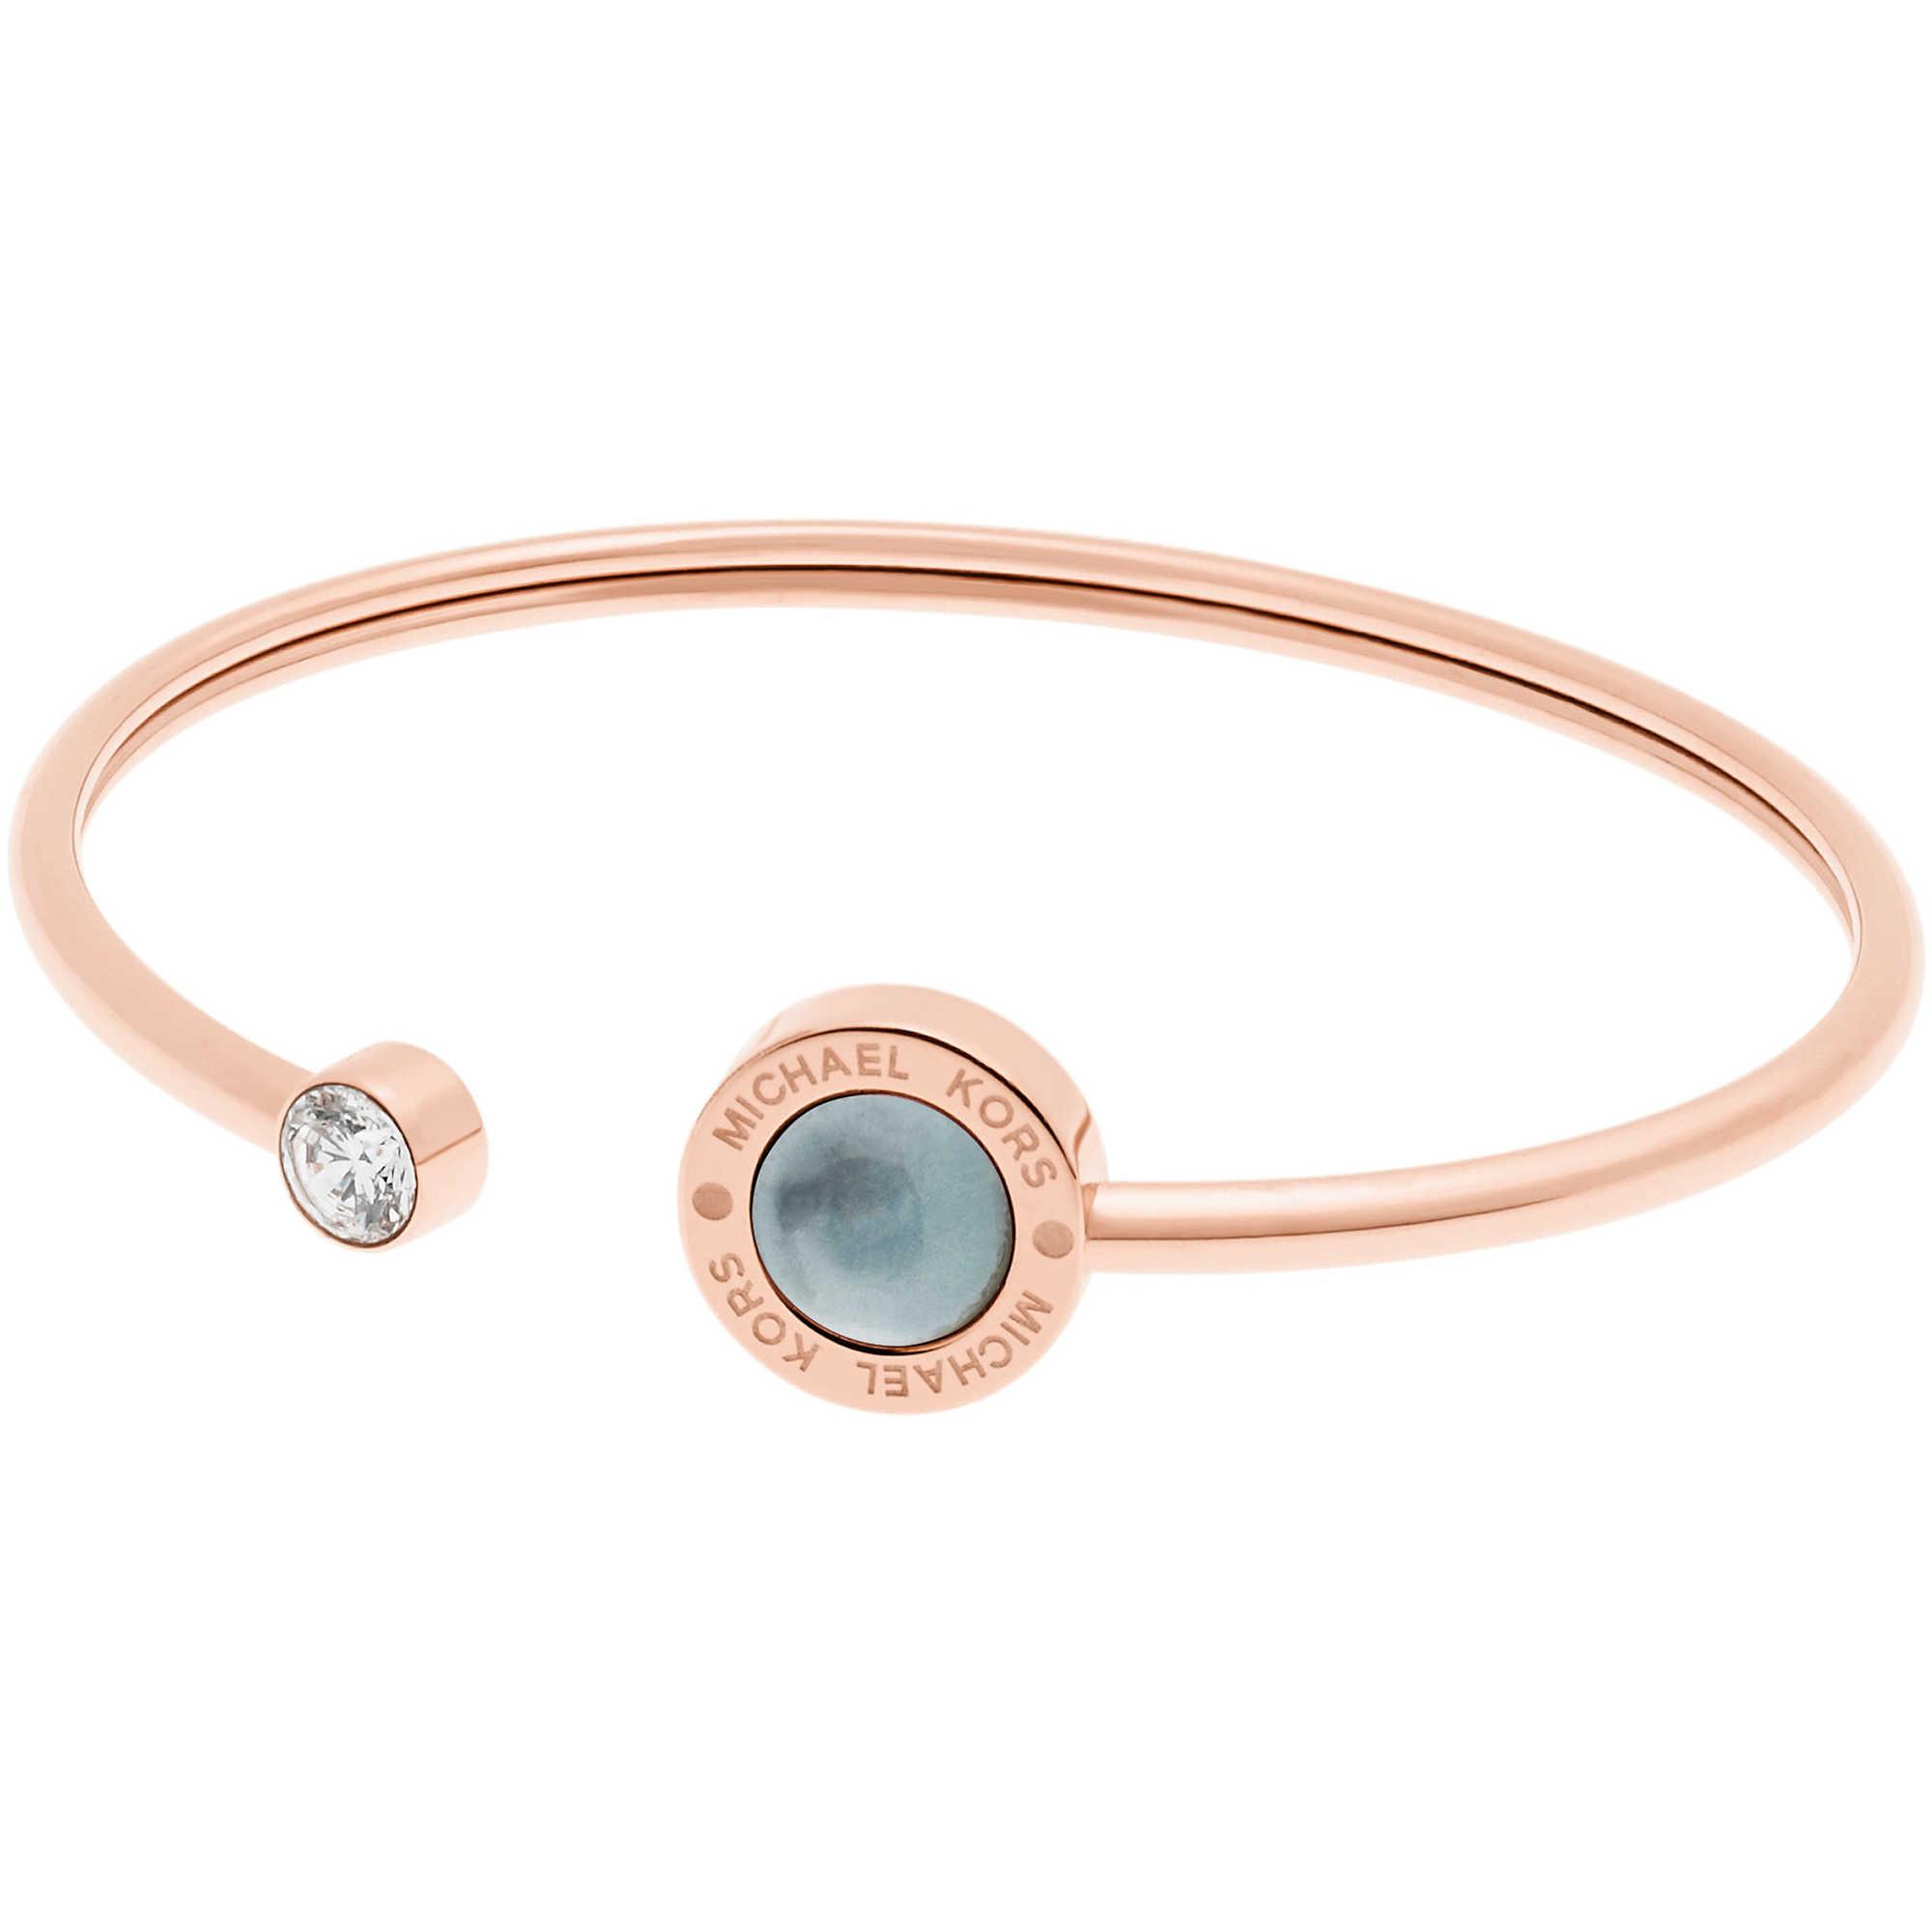 Bracelet Michael Kors Femme : bracelet femme bijoux michael kors mkj5868791 bracelets ~ Pogadajmy.info Styles, Décorations et Voitures